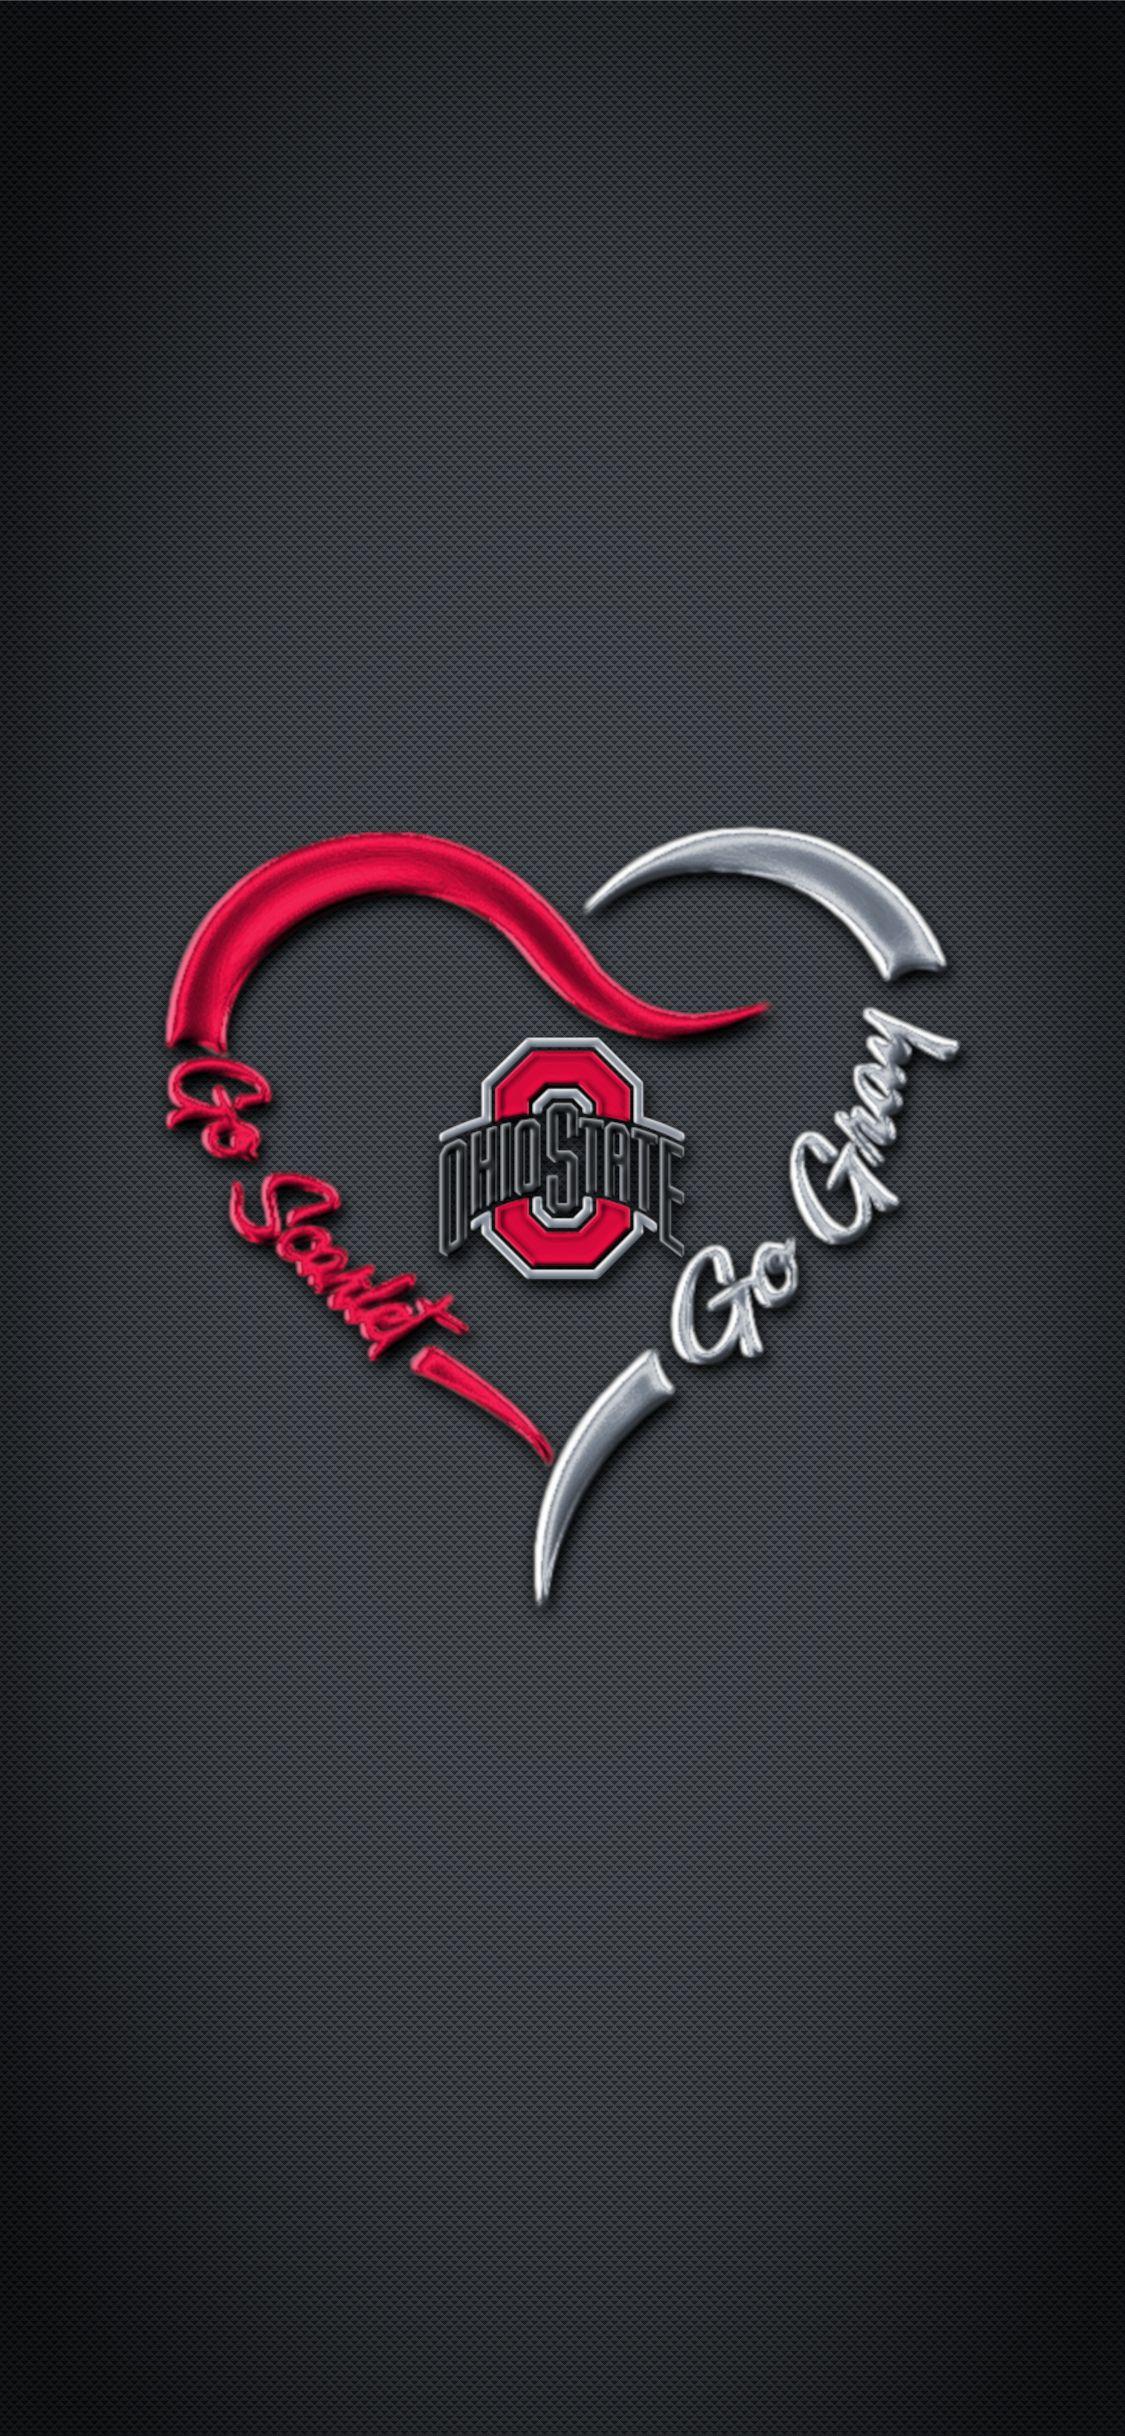 Ohio State Buckeyes Football logo phone wallpaper